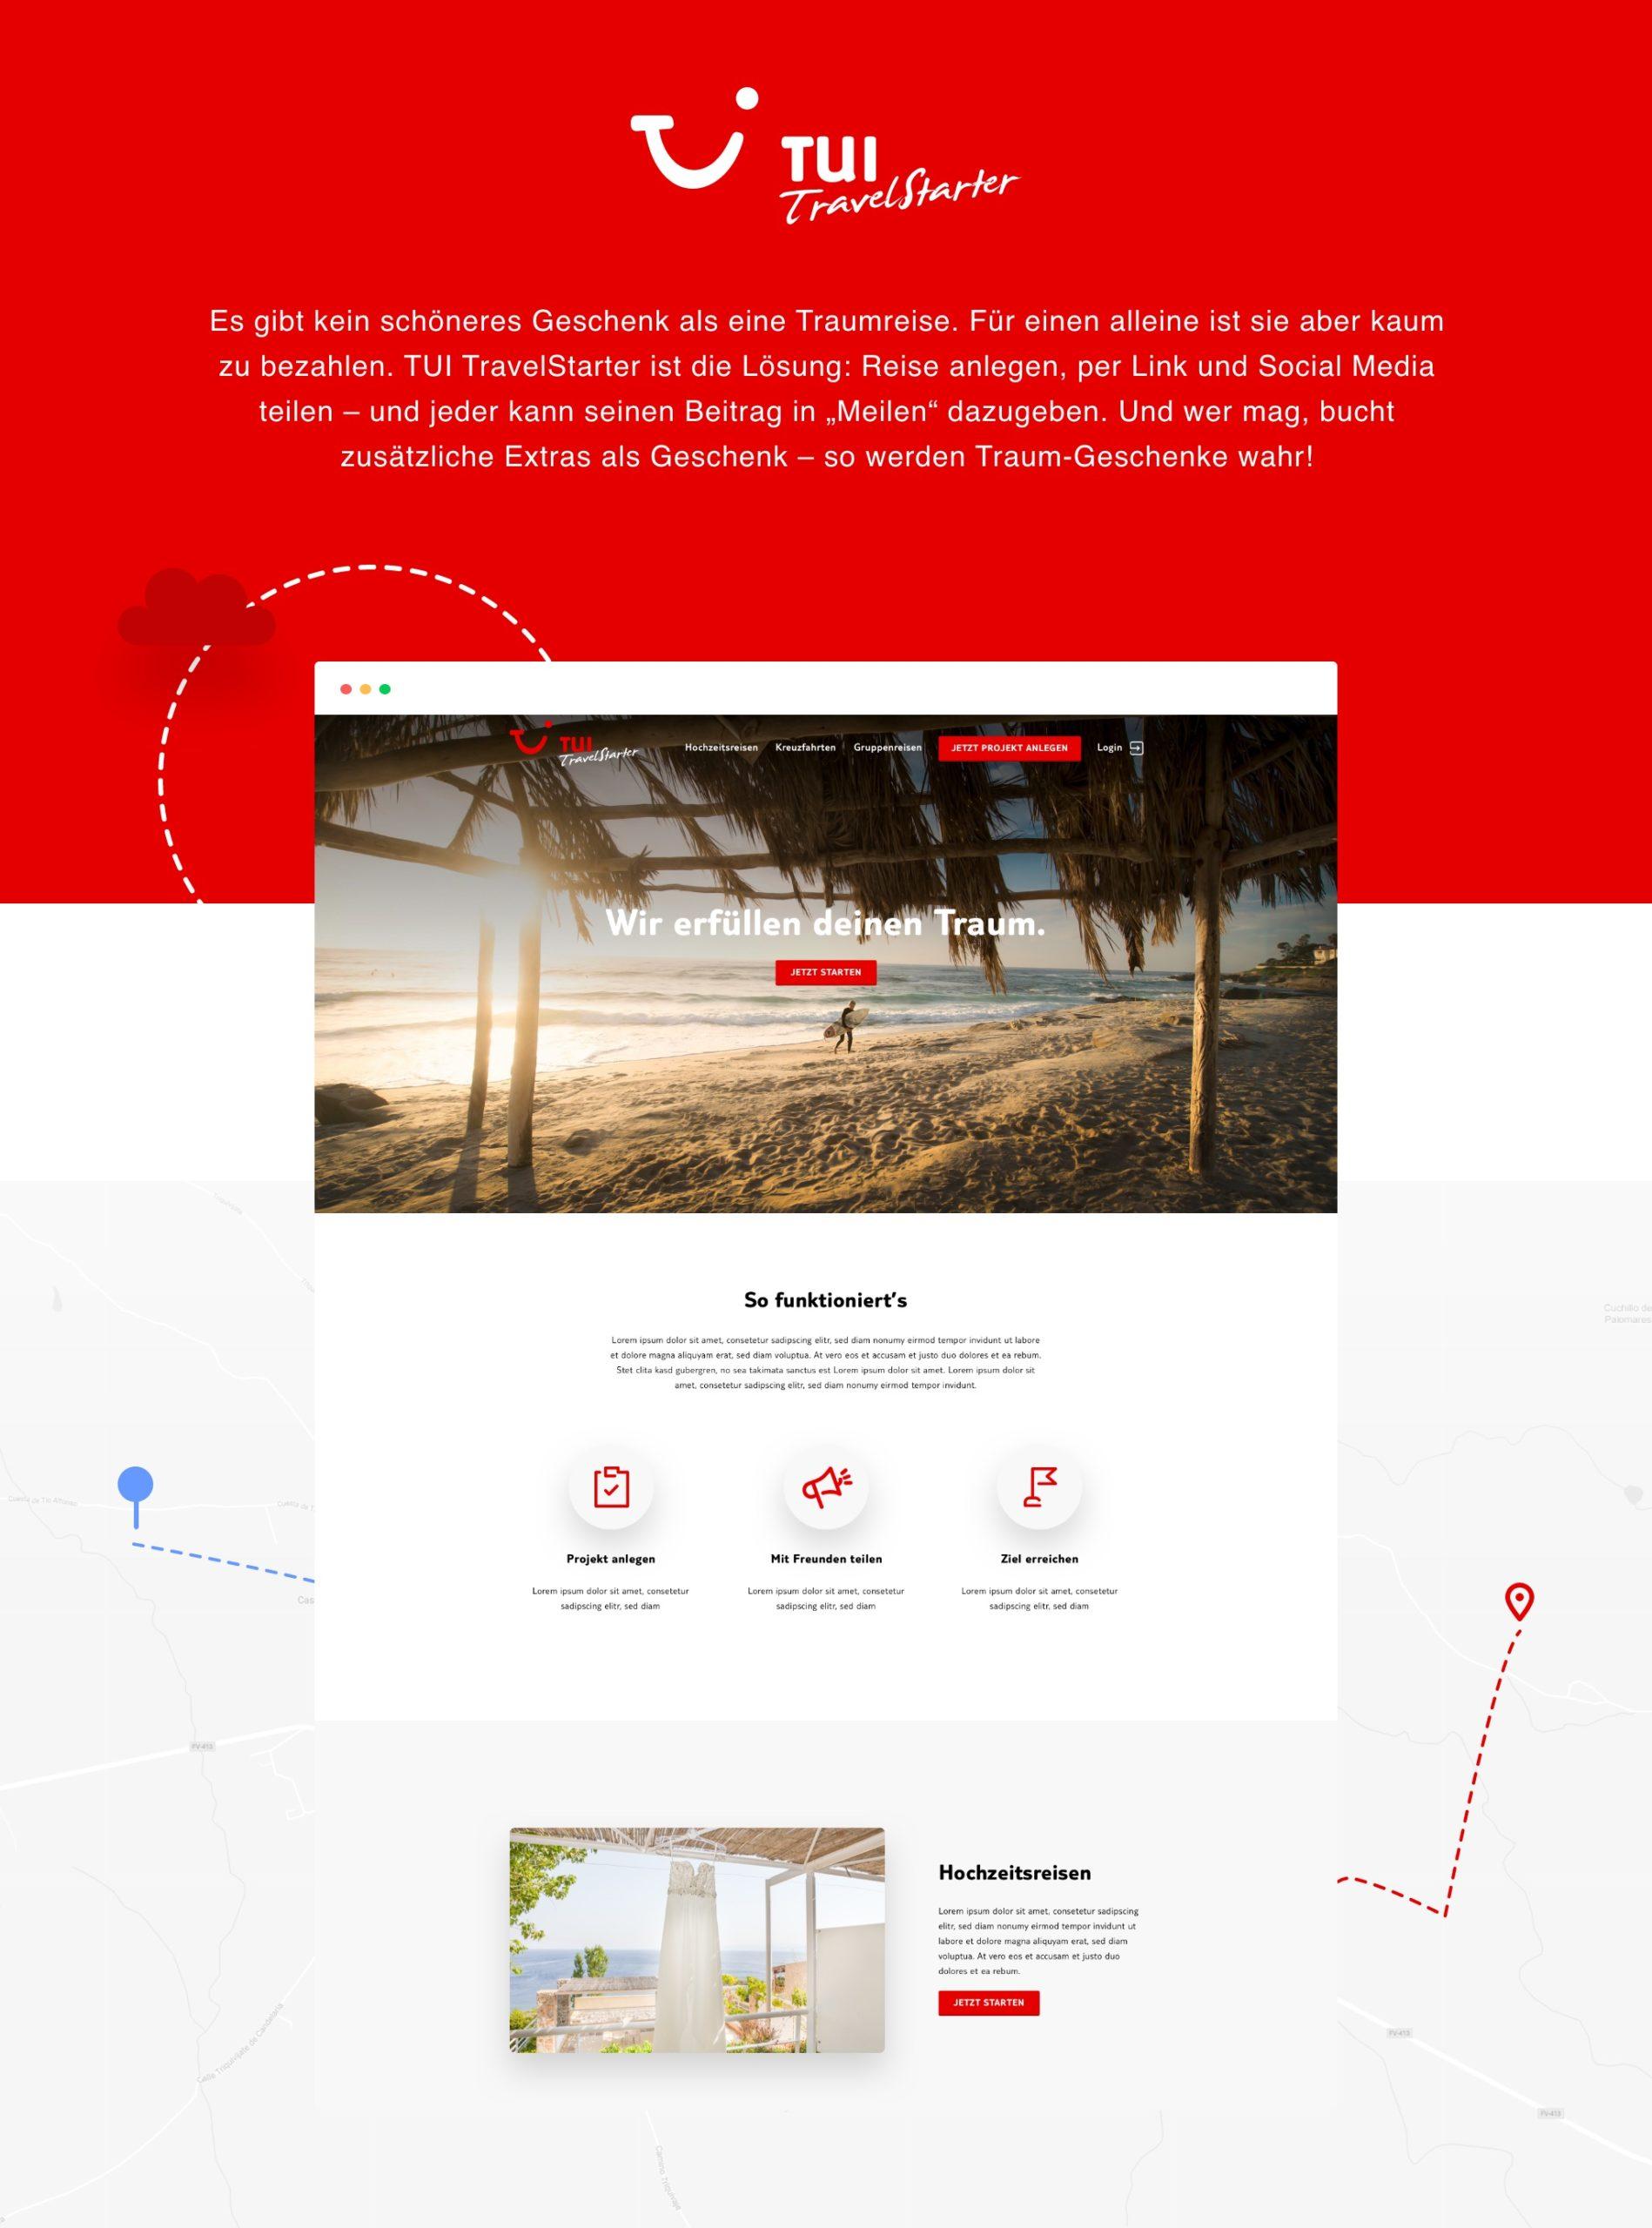 TUI-TravelStarter-App-and-Website-Web-01@2x